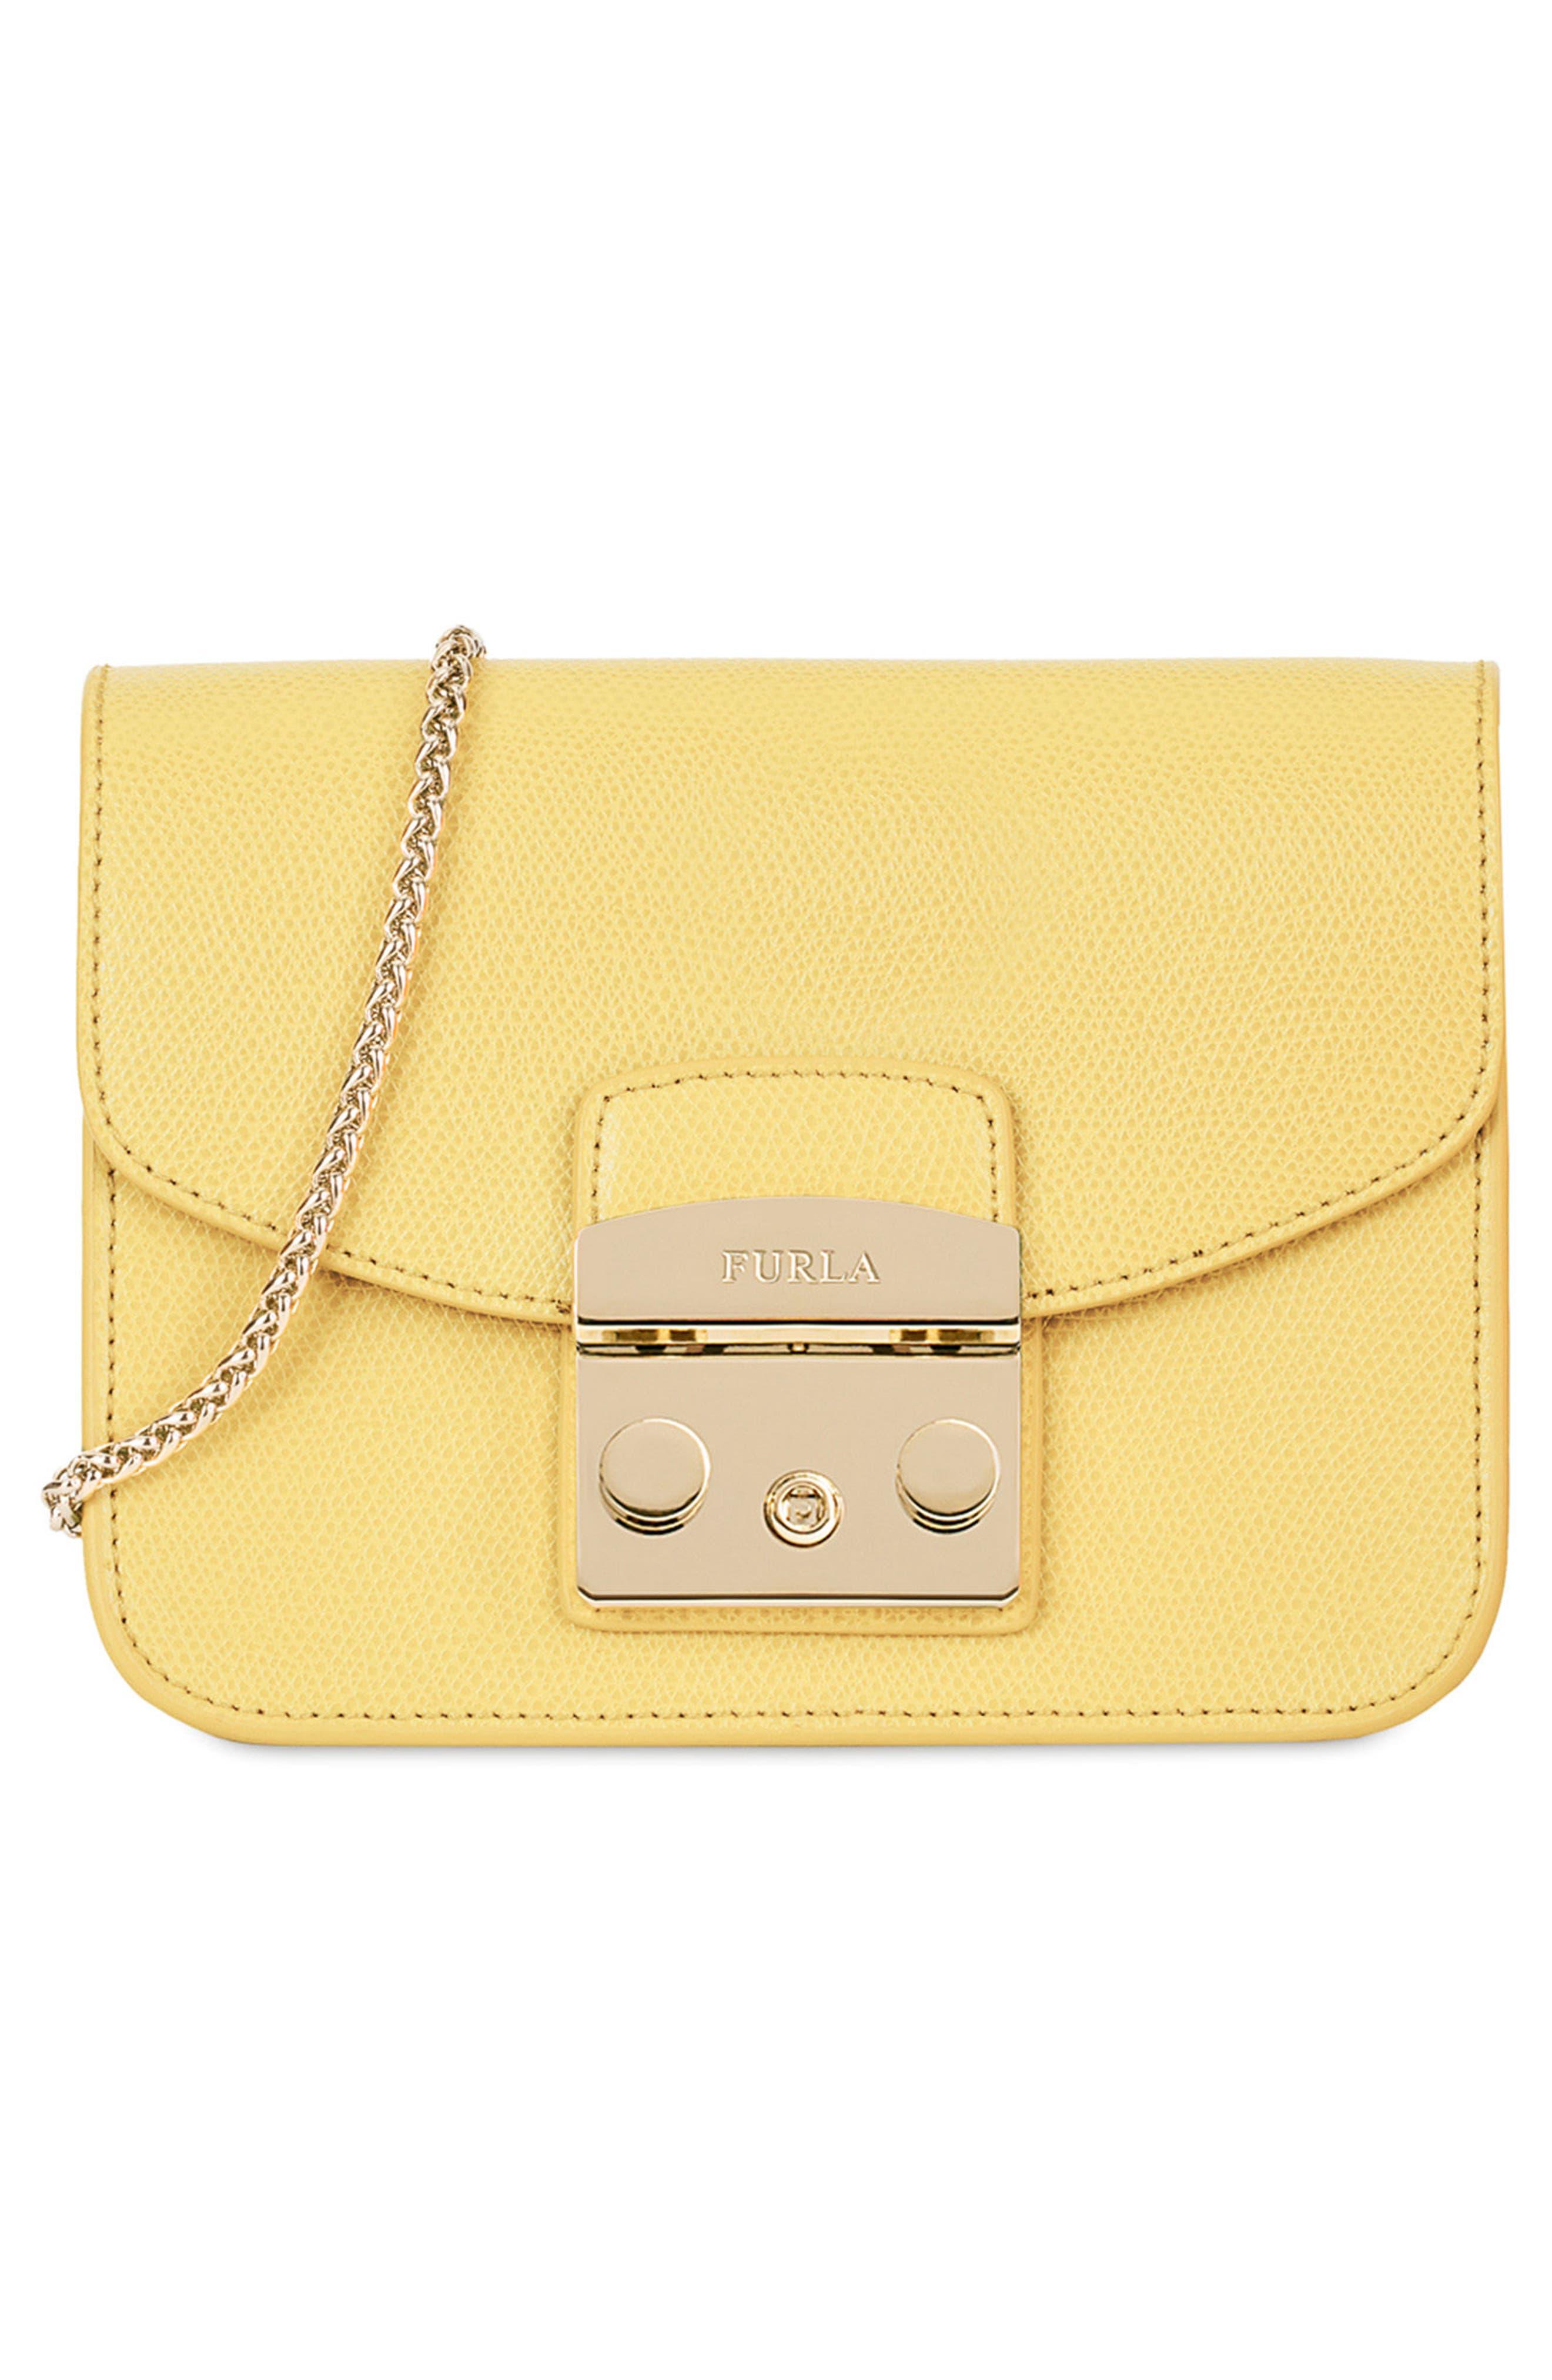 Main Image - Furla Mini Metropolis Leather Crossbody Bag